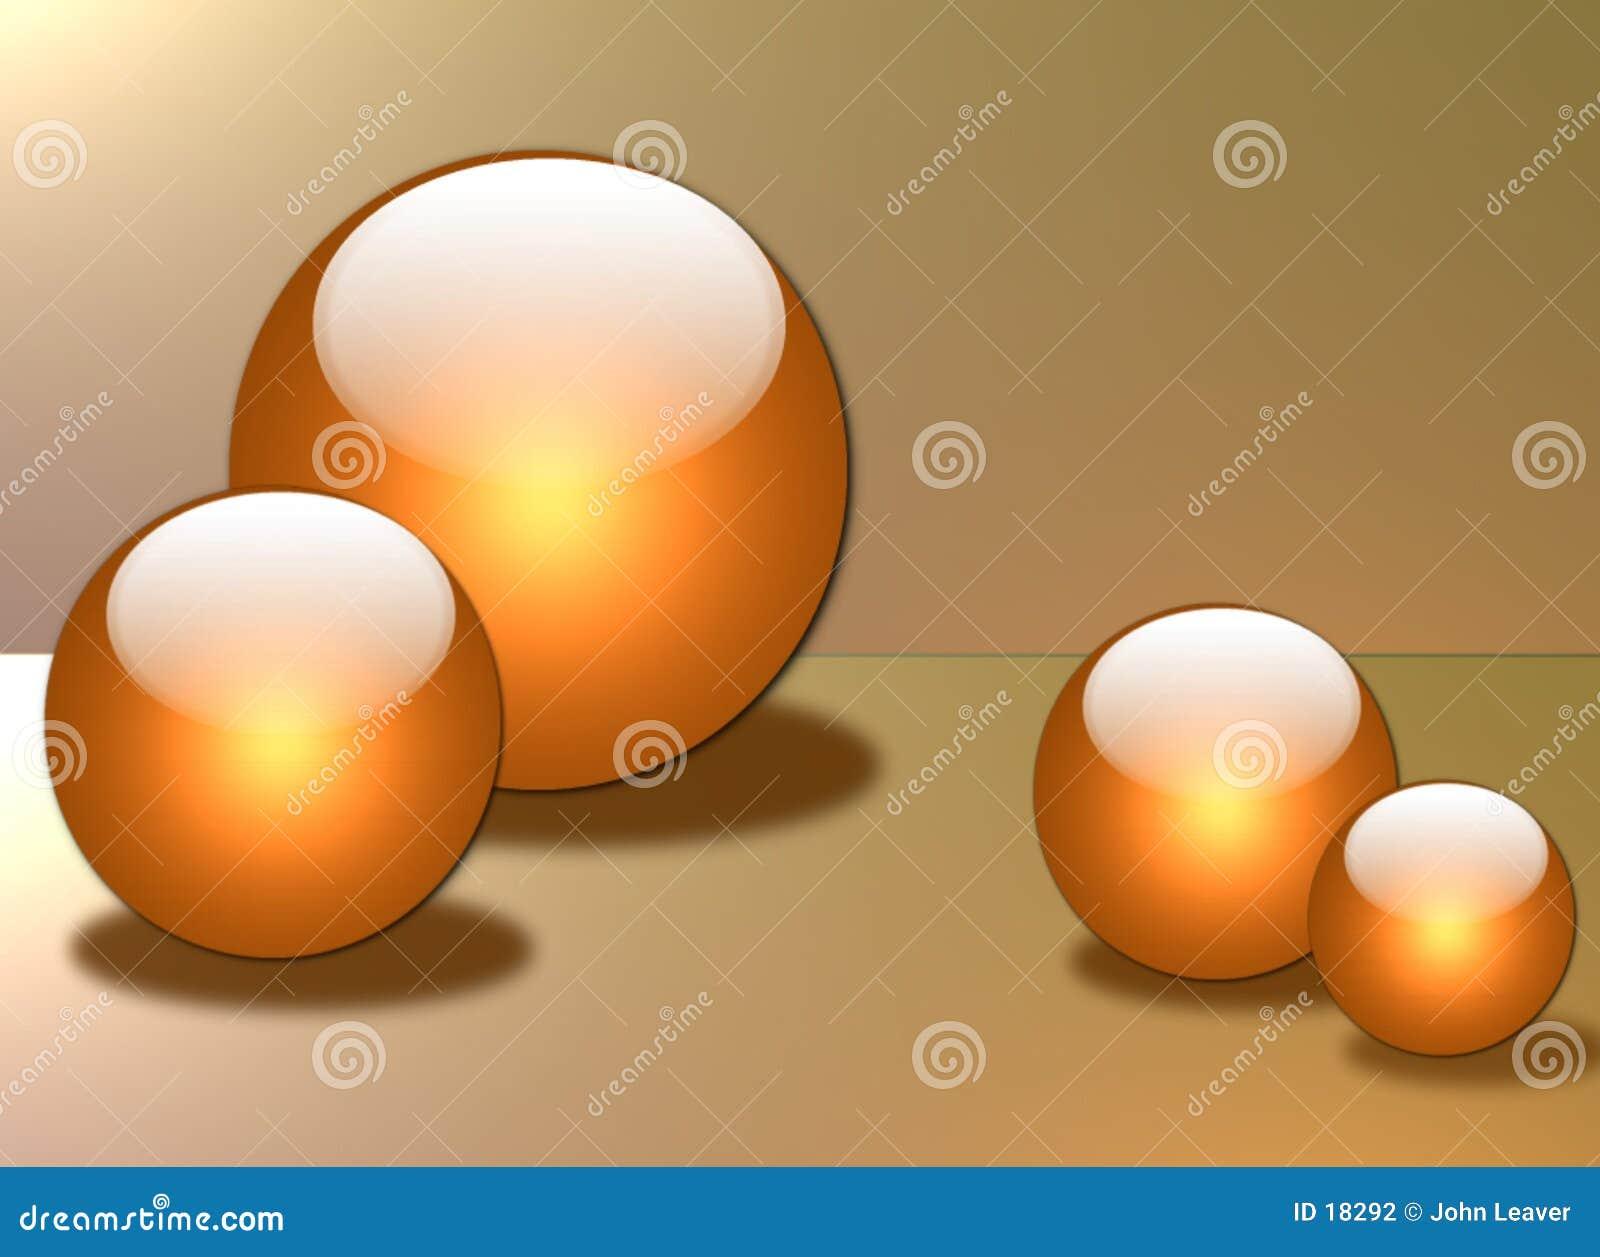 Sphères en verre